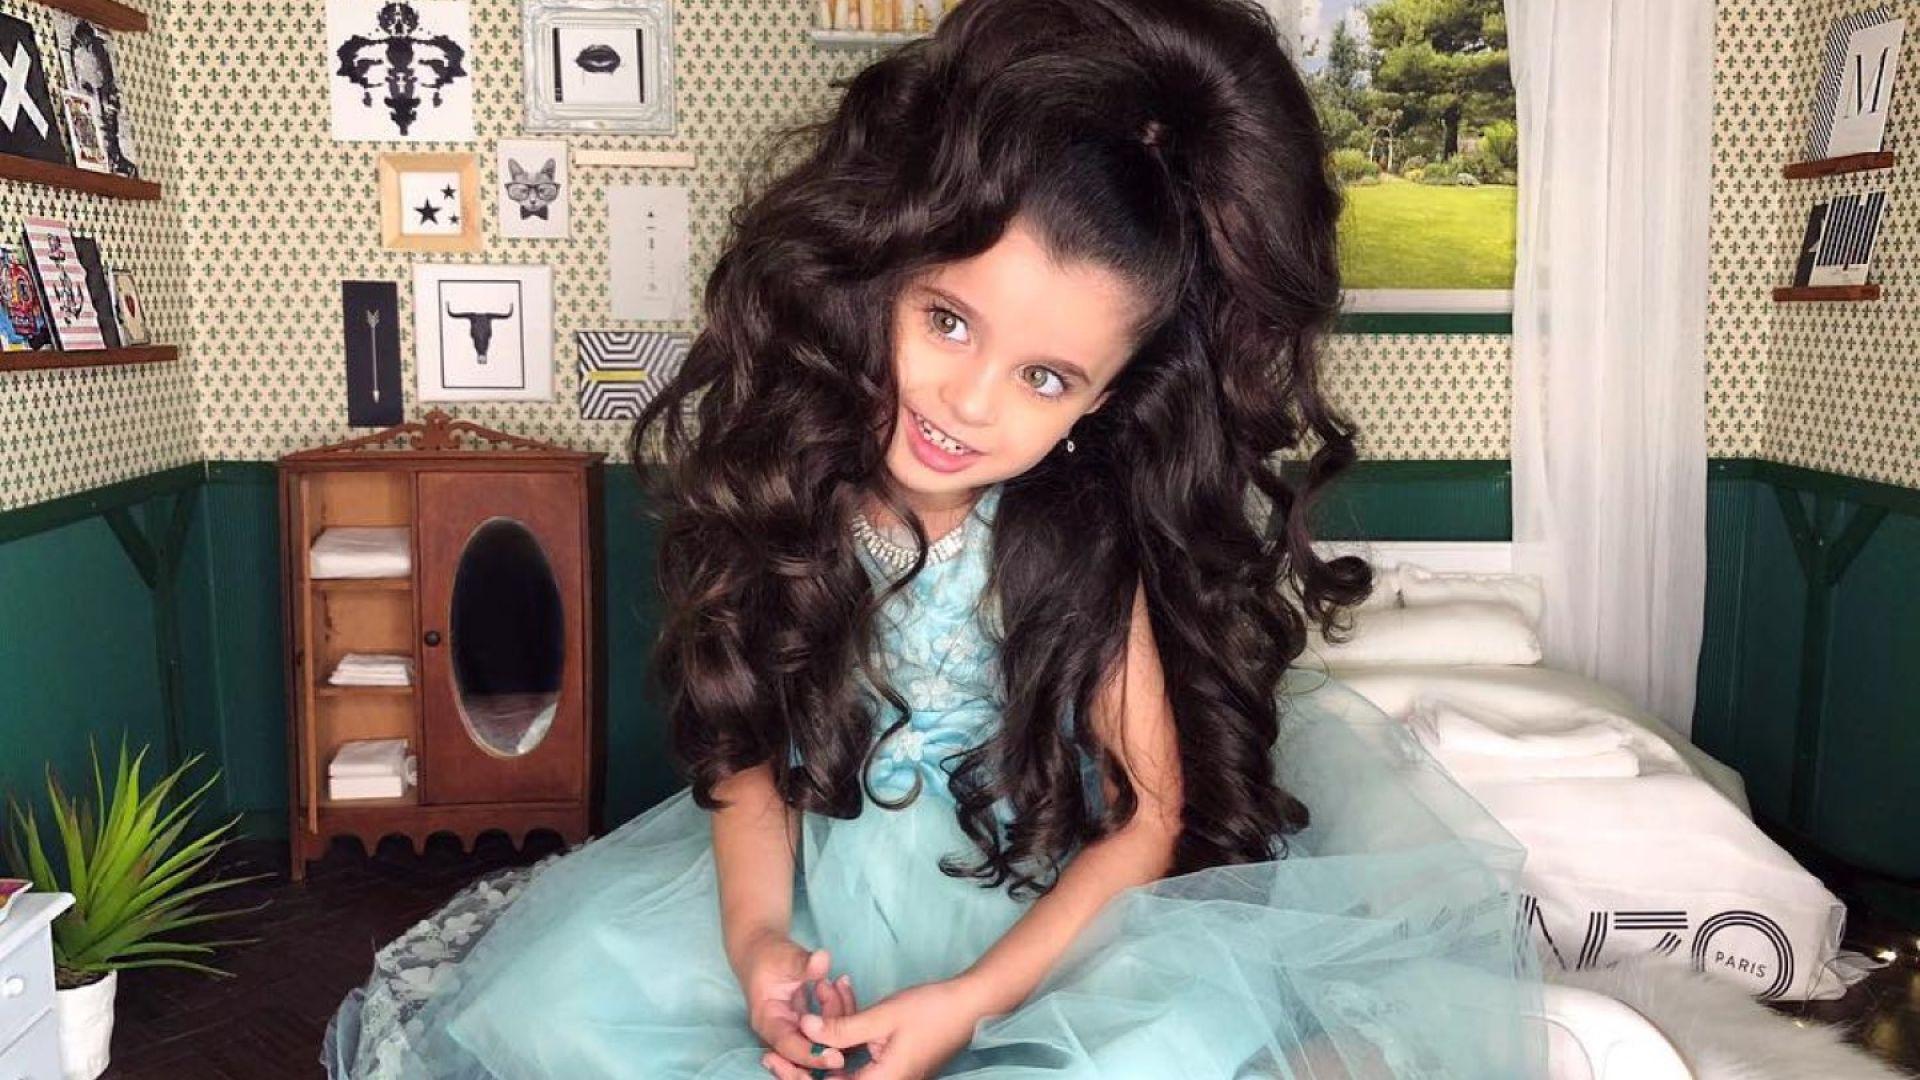 5-годишно момиченце стана Instagram звезда заради косата си